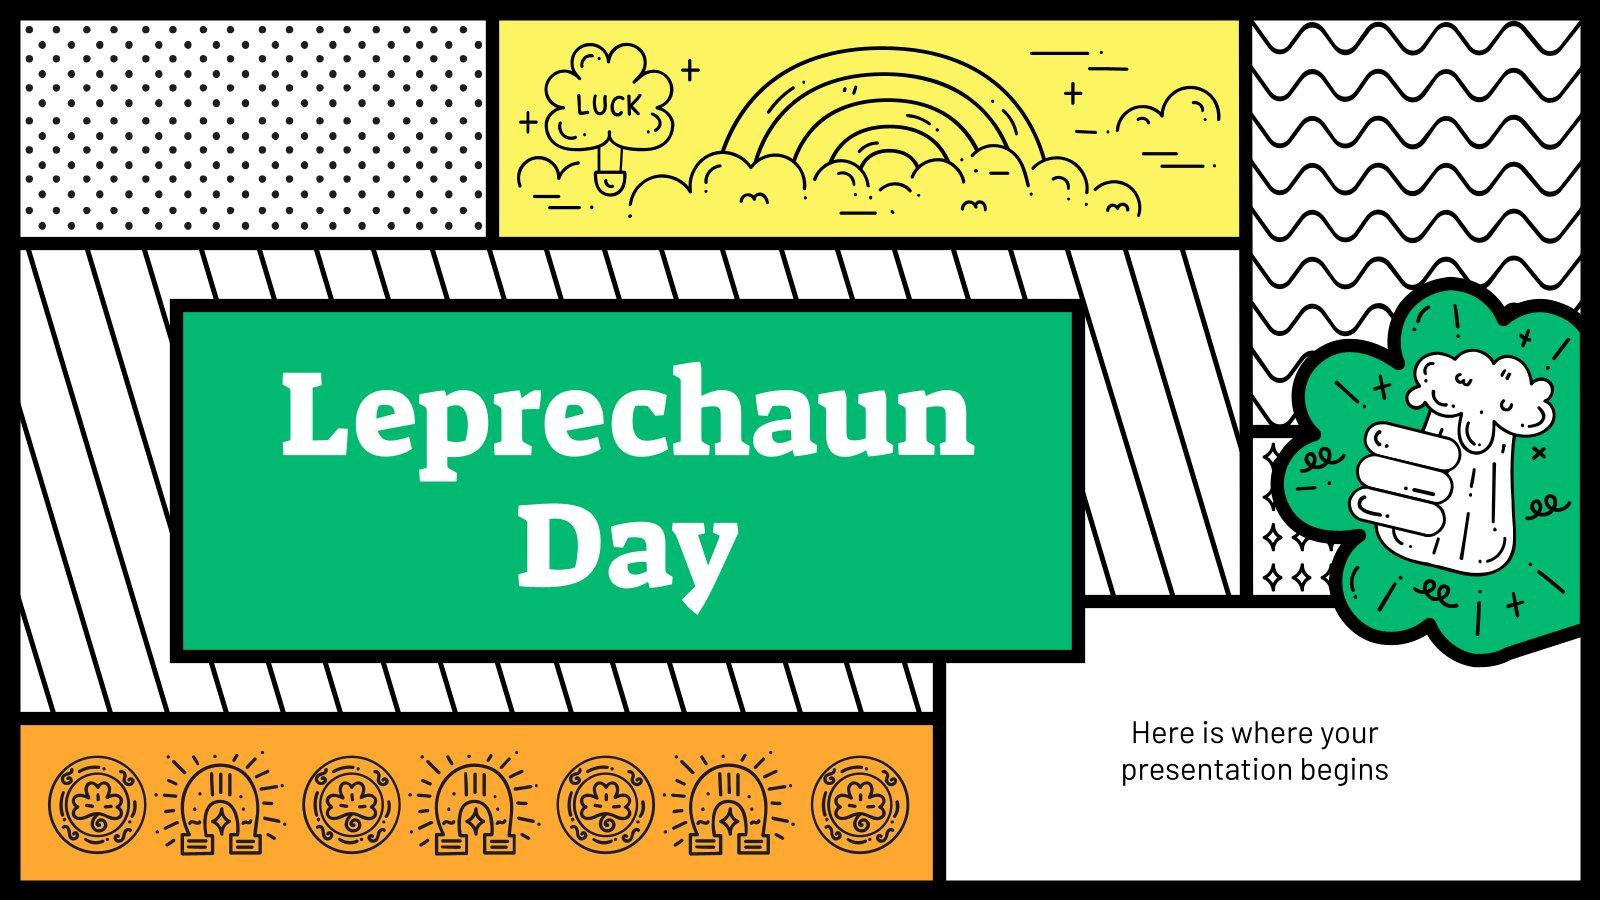 Leprechaun Day presentation template